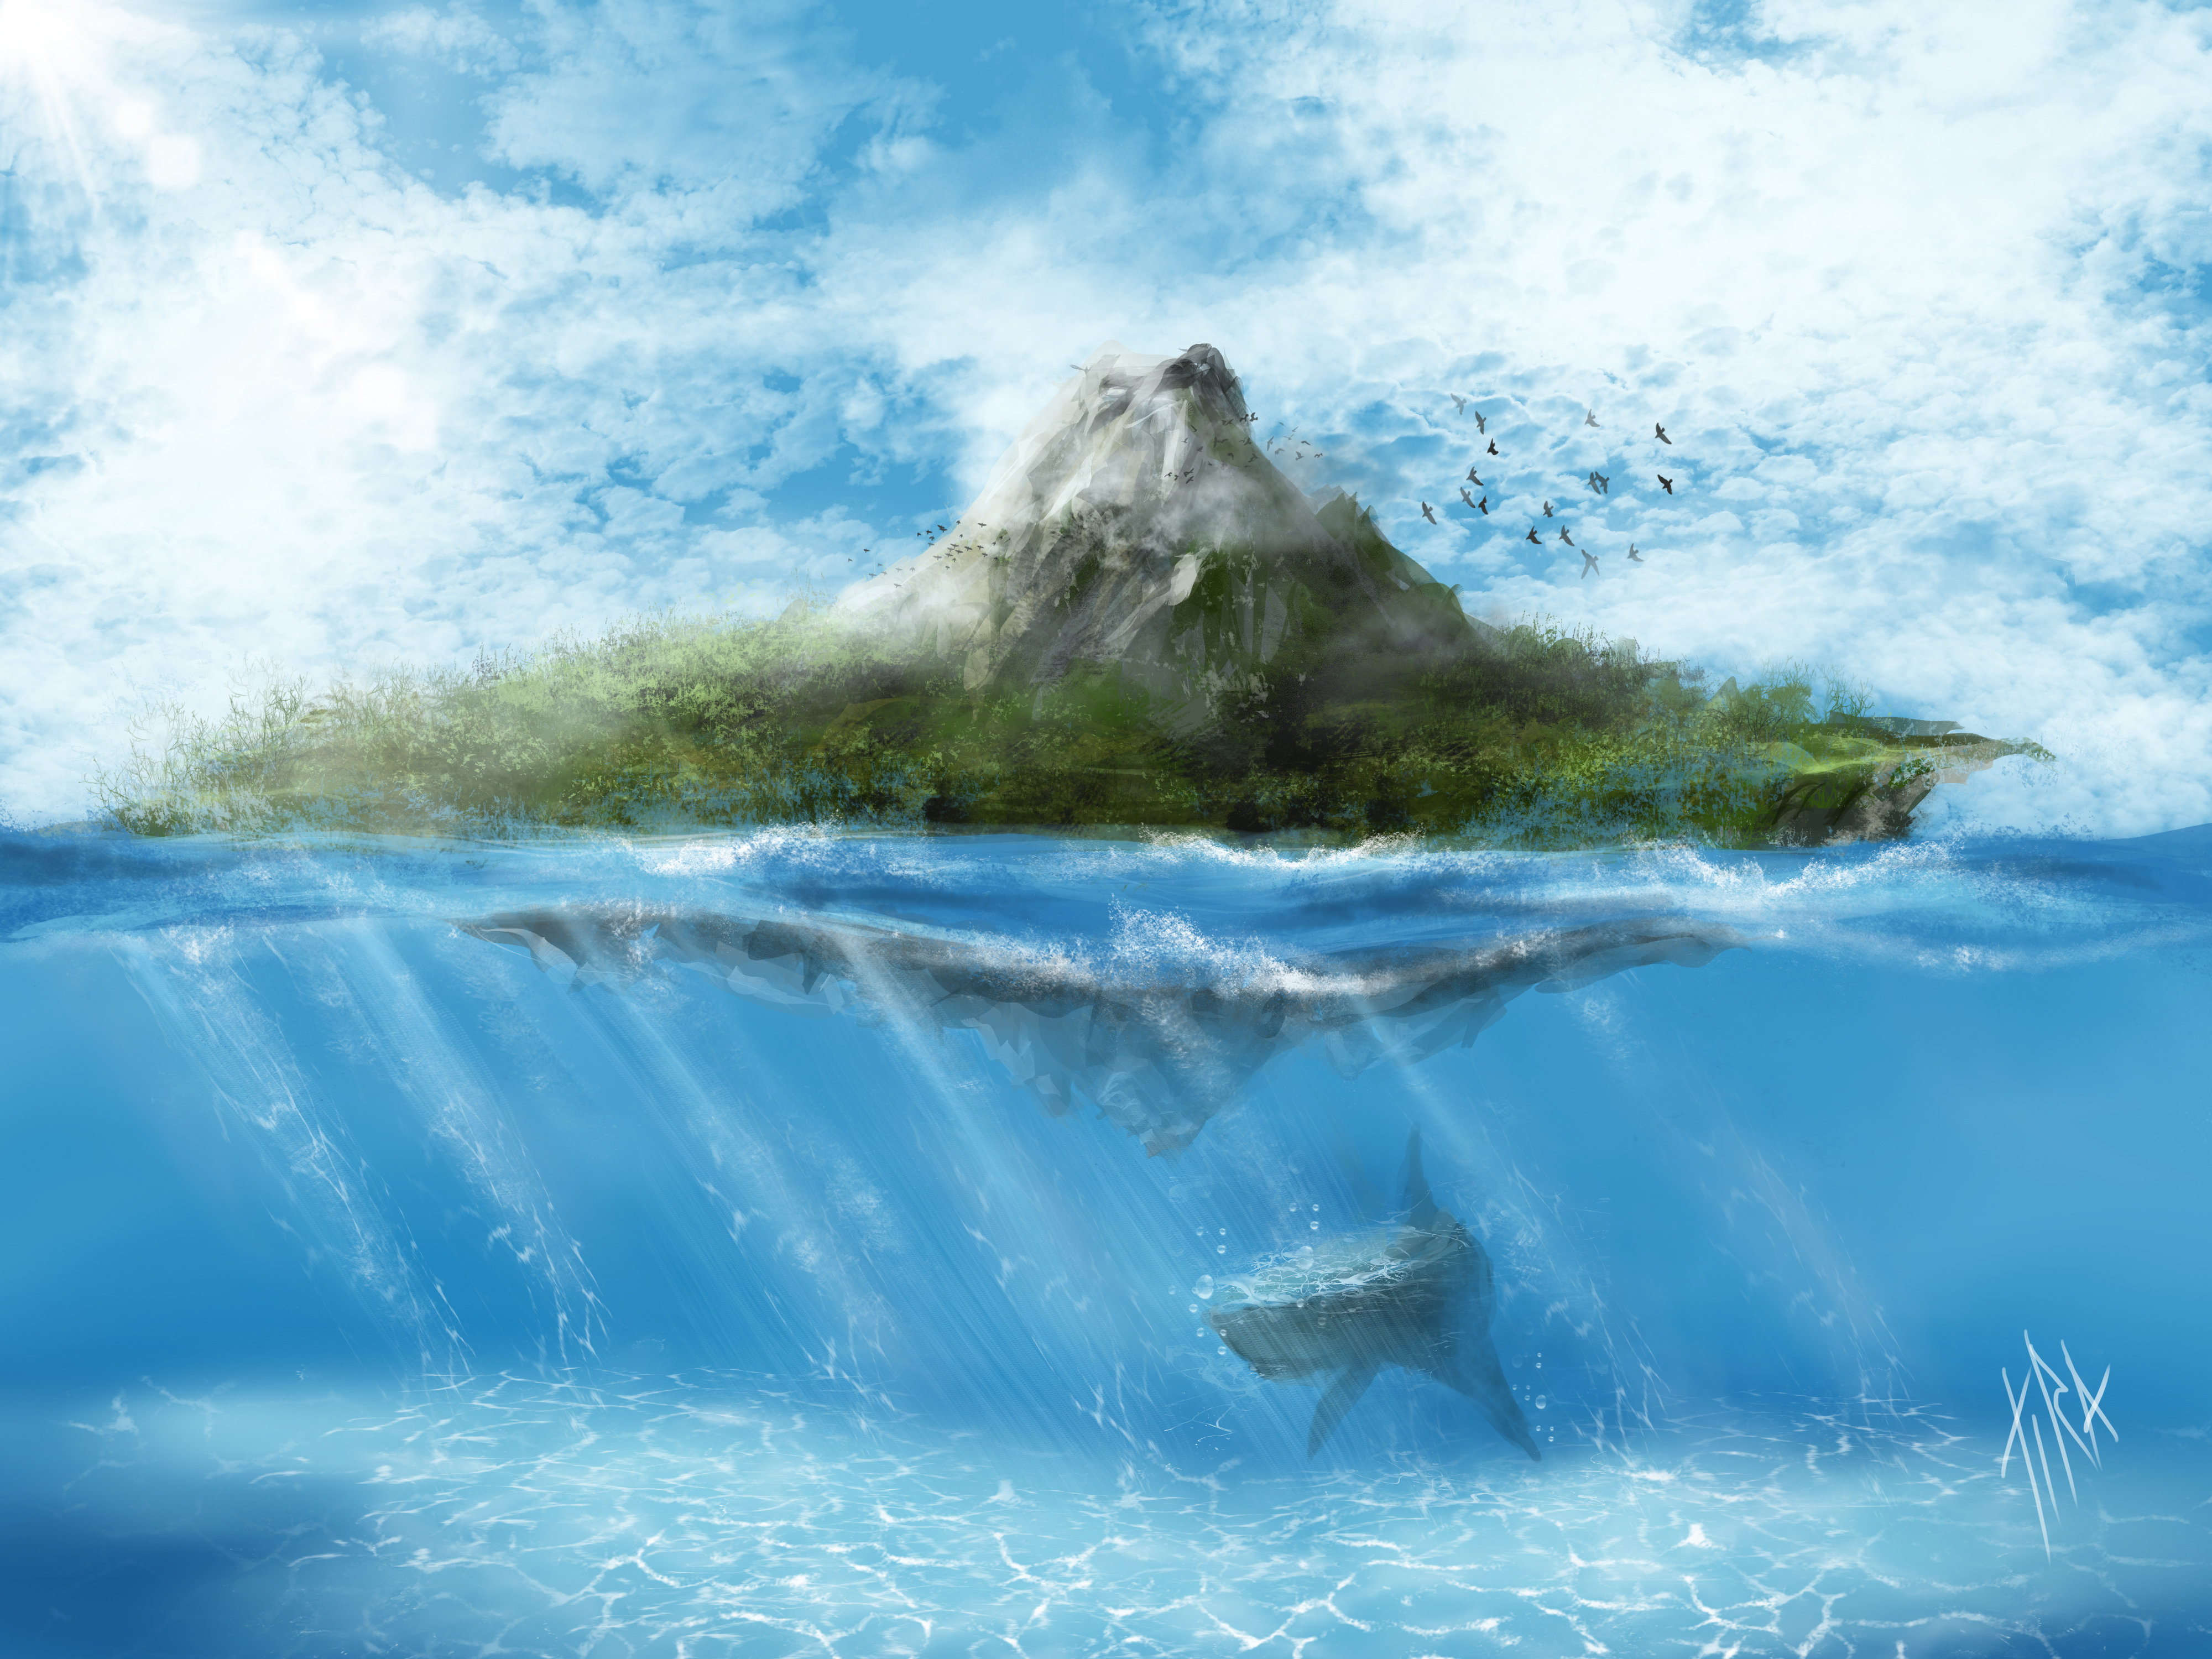 фэнтези картинки природа море молодом организме